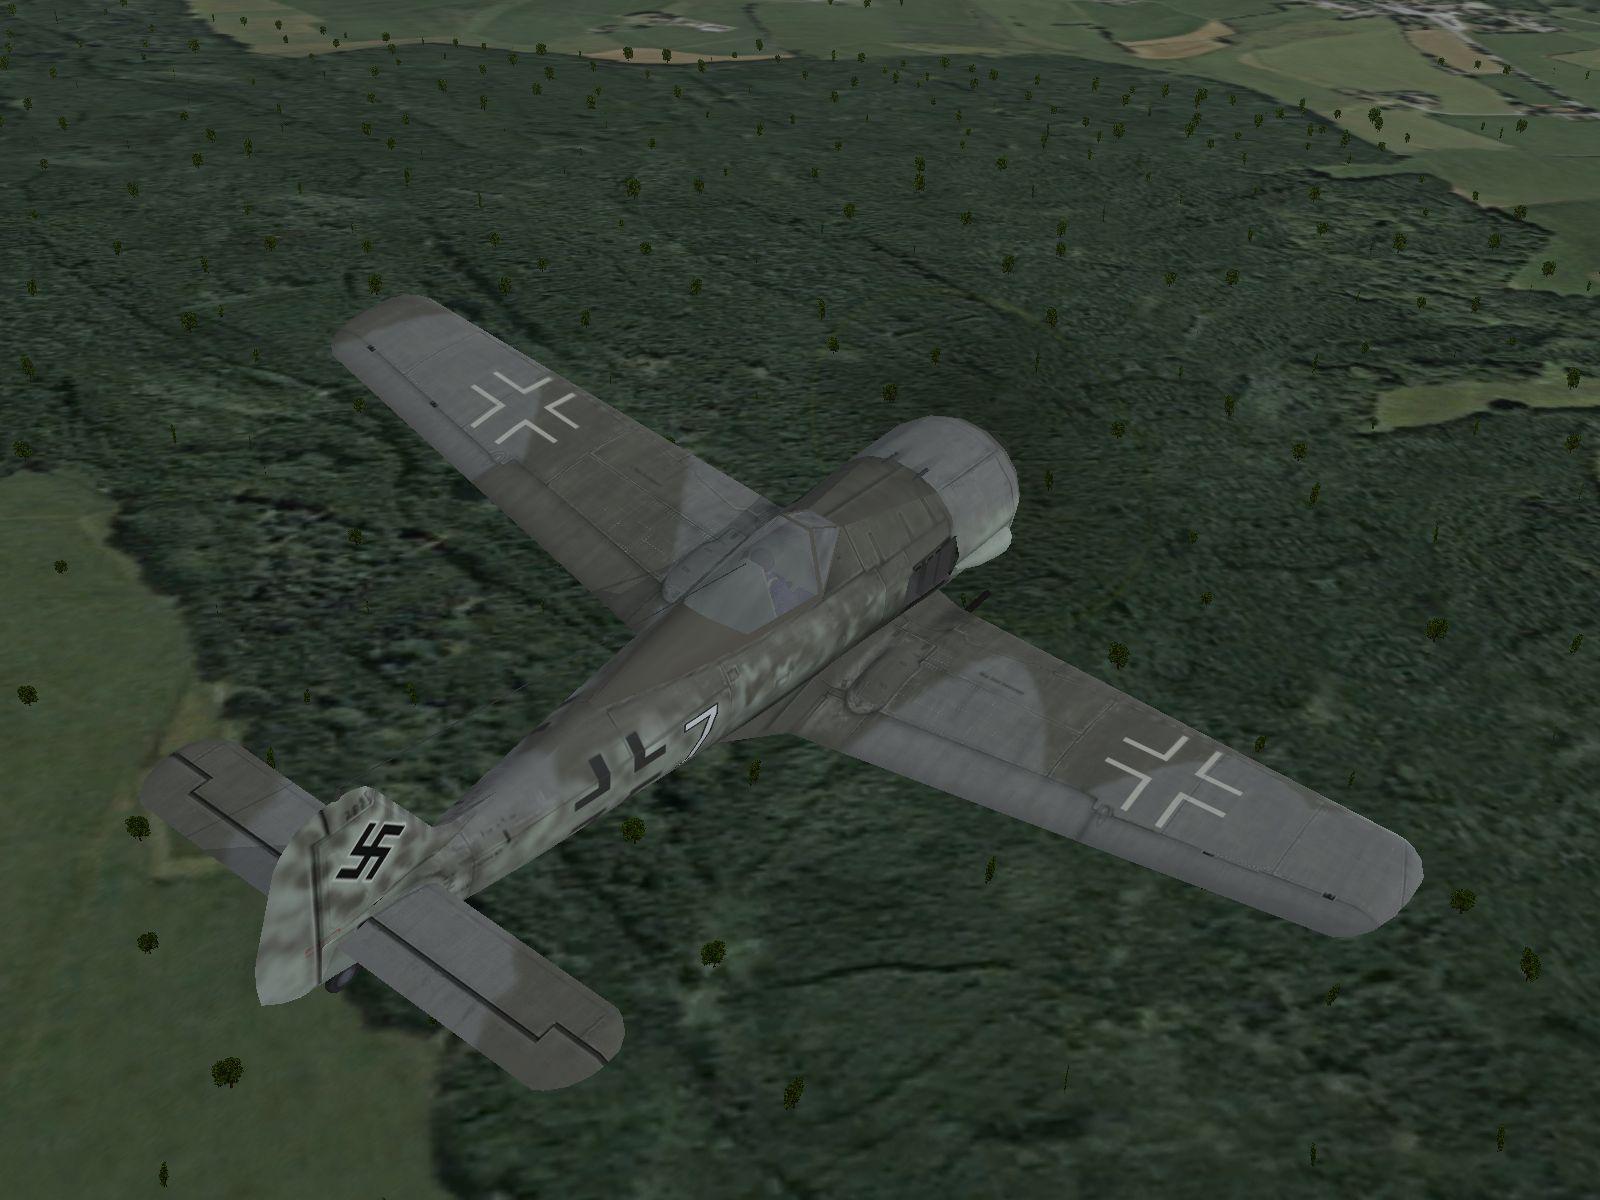 Fw 190 14